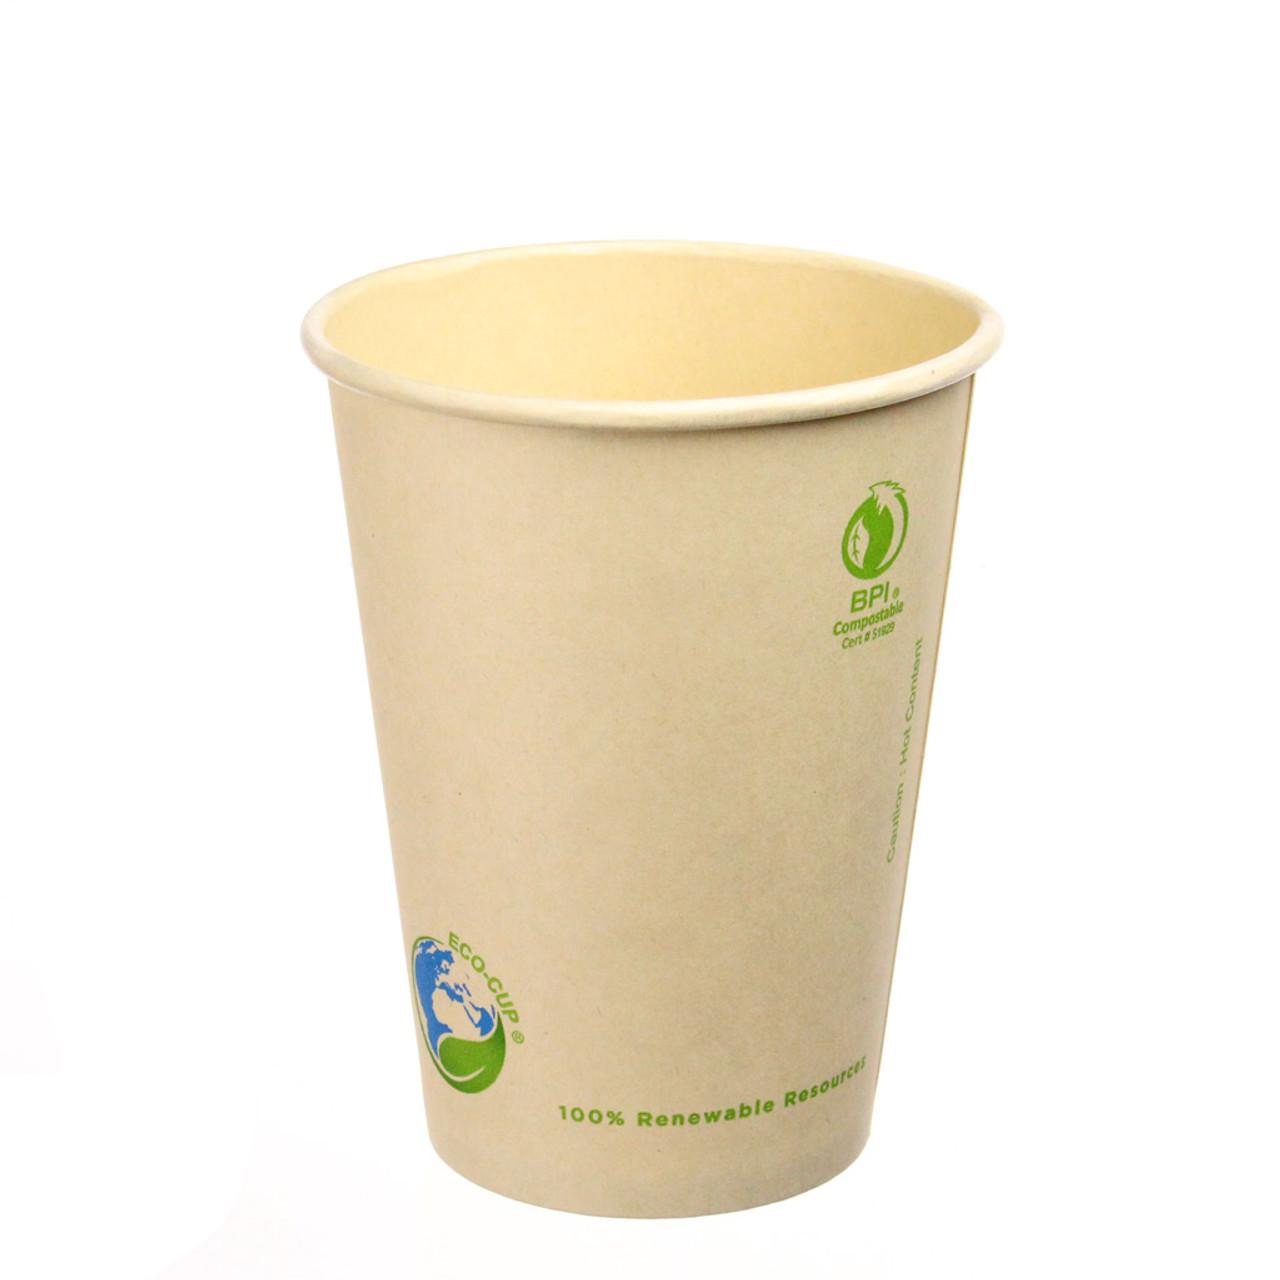 12oz Bamboo Fiber Hot Cups